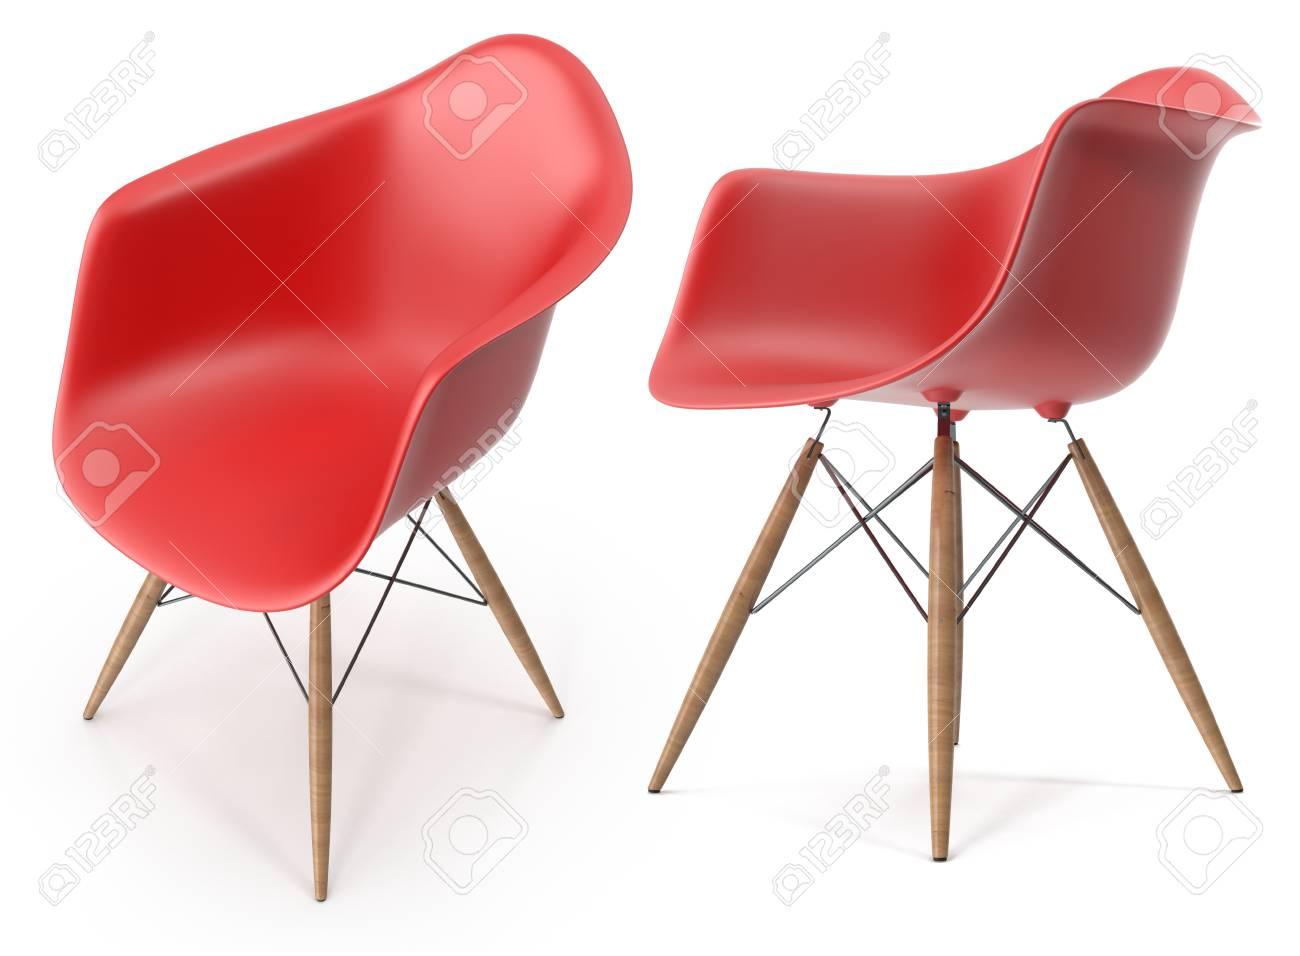 banque d images chaise moderne rouge illustration 3d isolee sur fond blanc